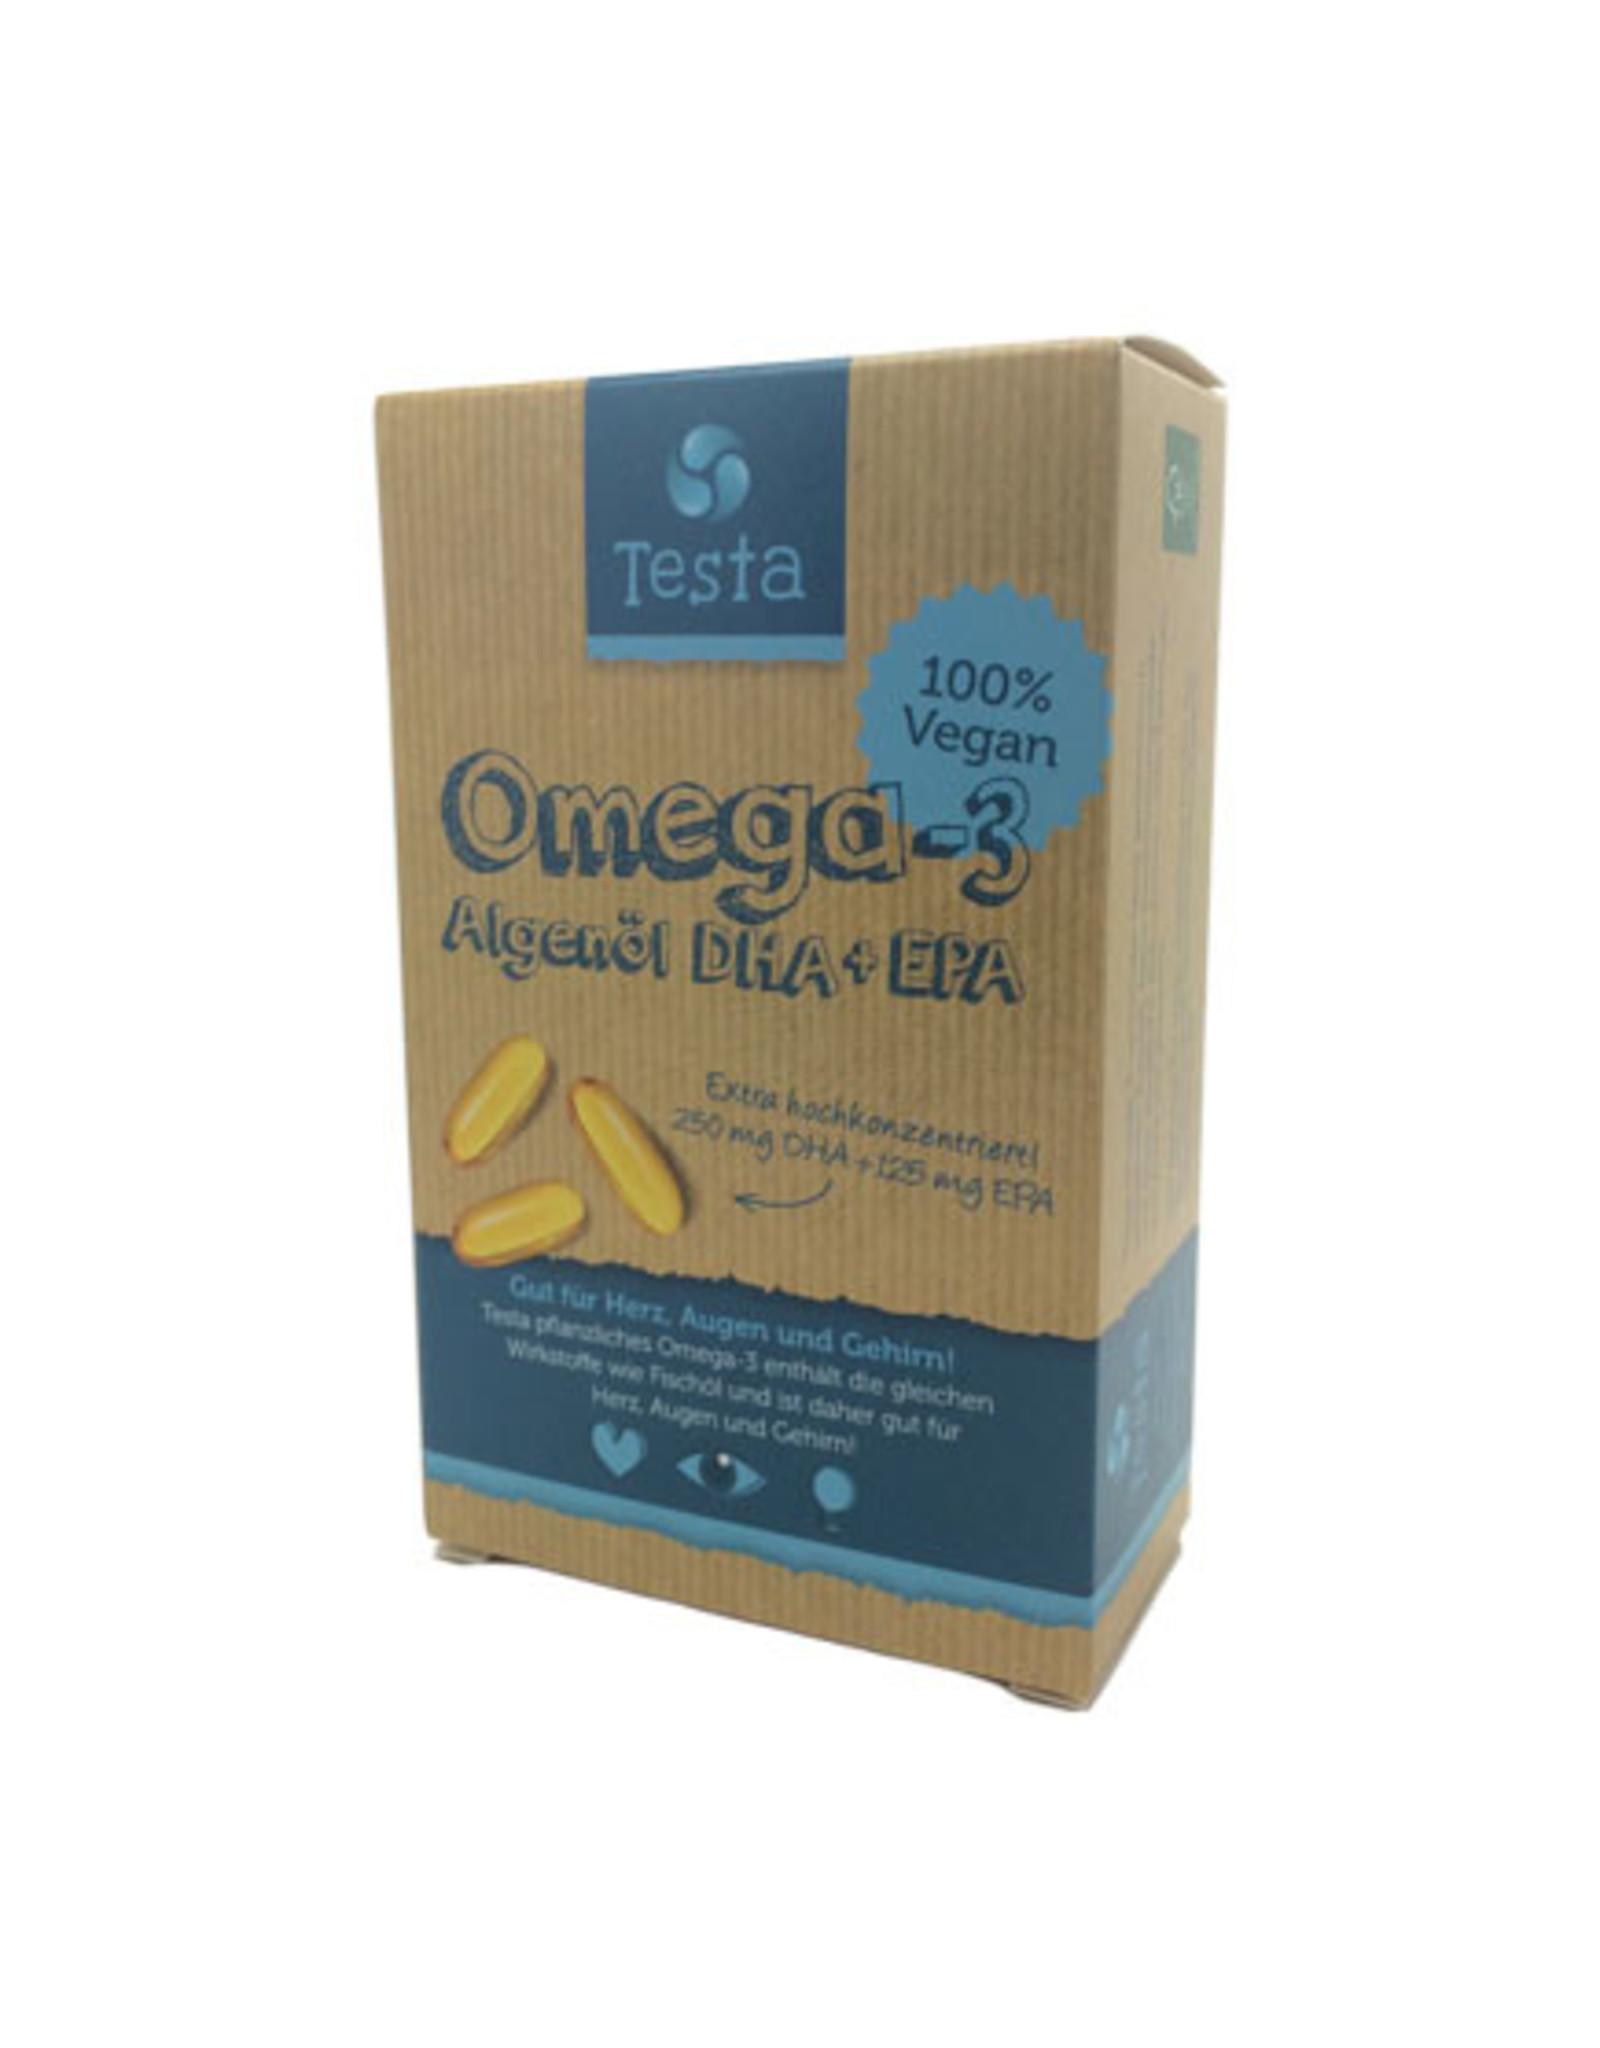 TESTA OMEGA-3 DHA + EPA, 45 CÁPSULAS